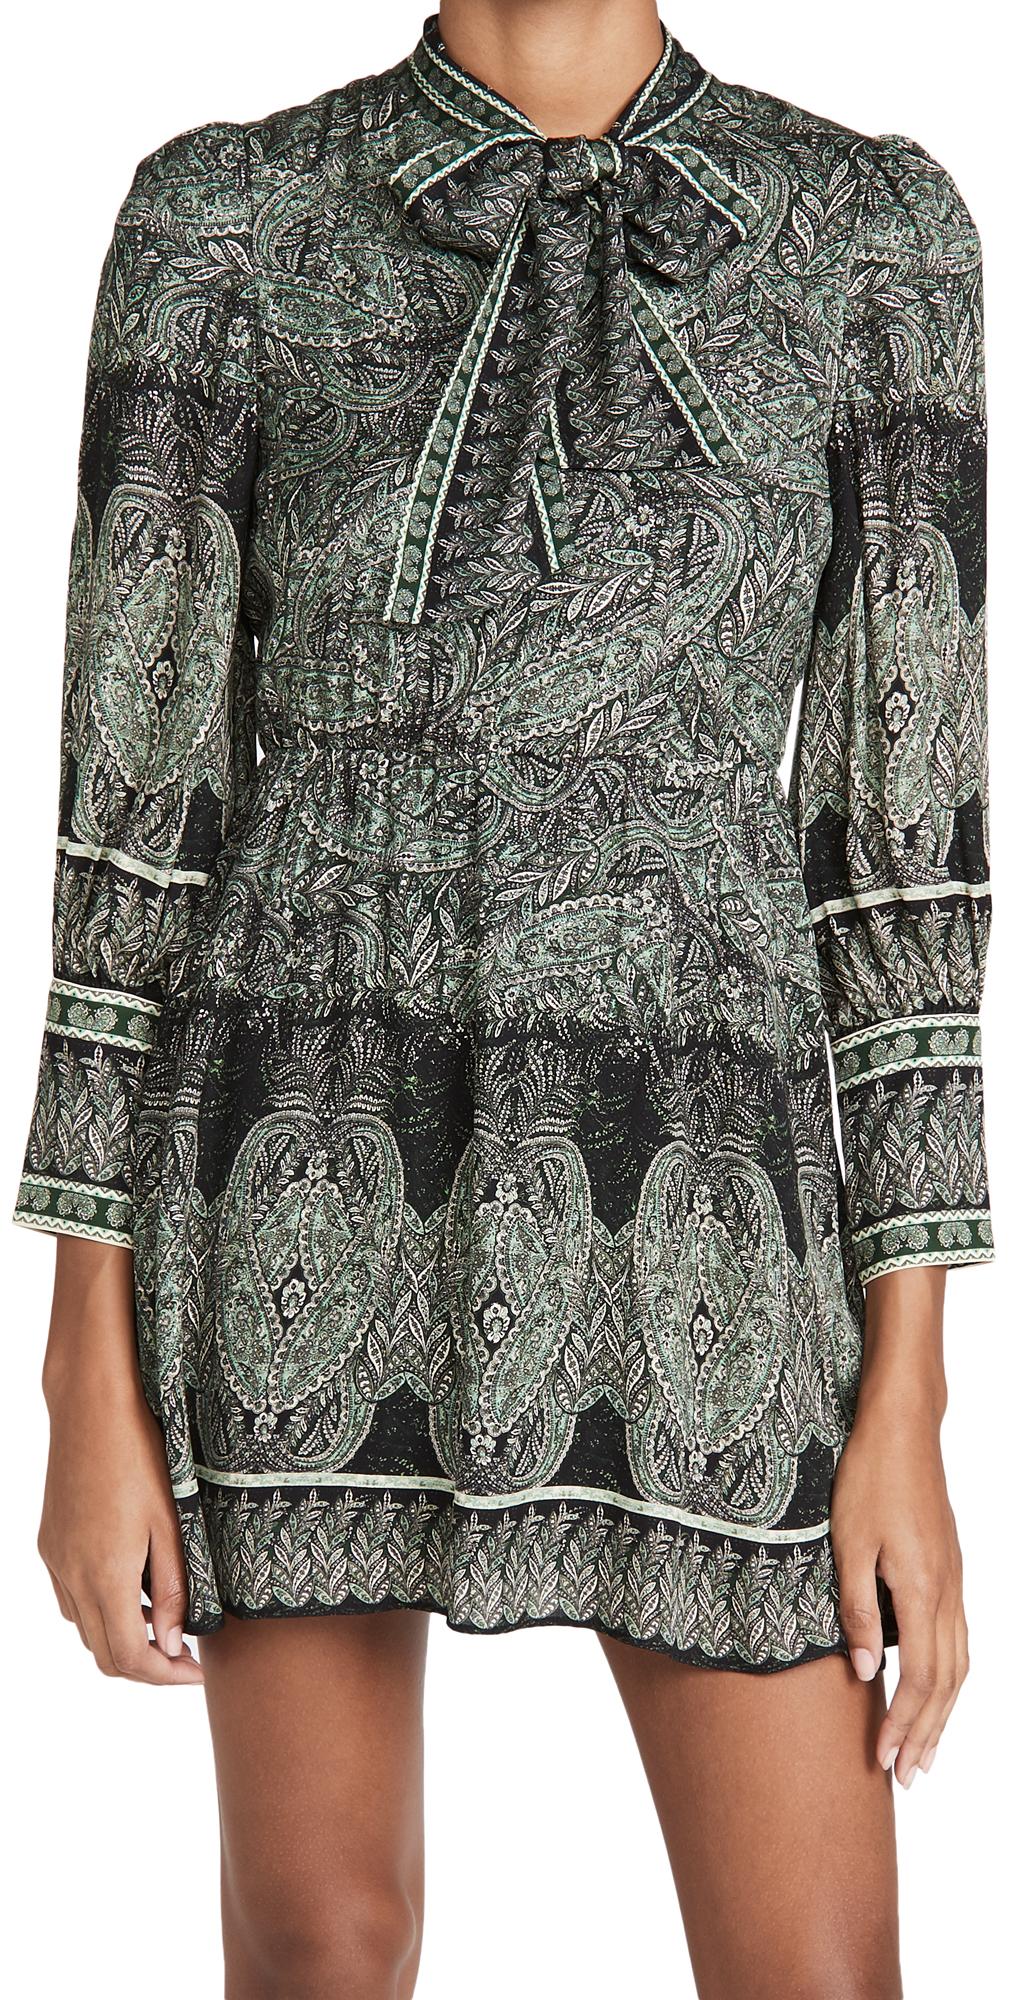 alice + olivia Tanisha Flare Dress with Neck Tie